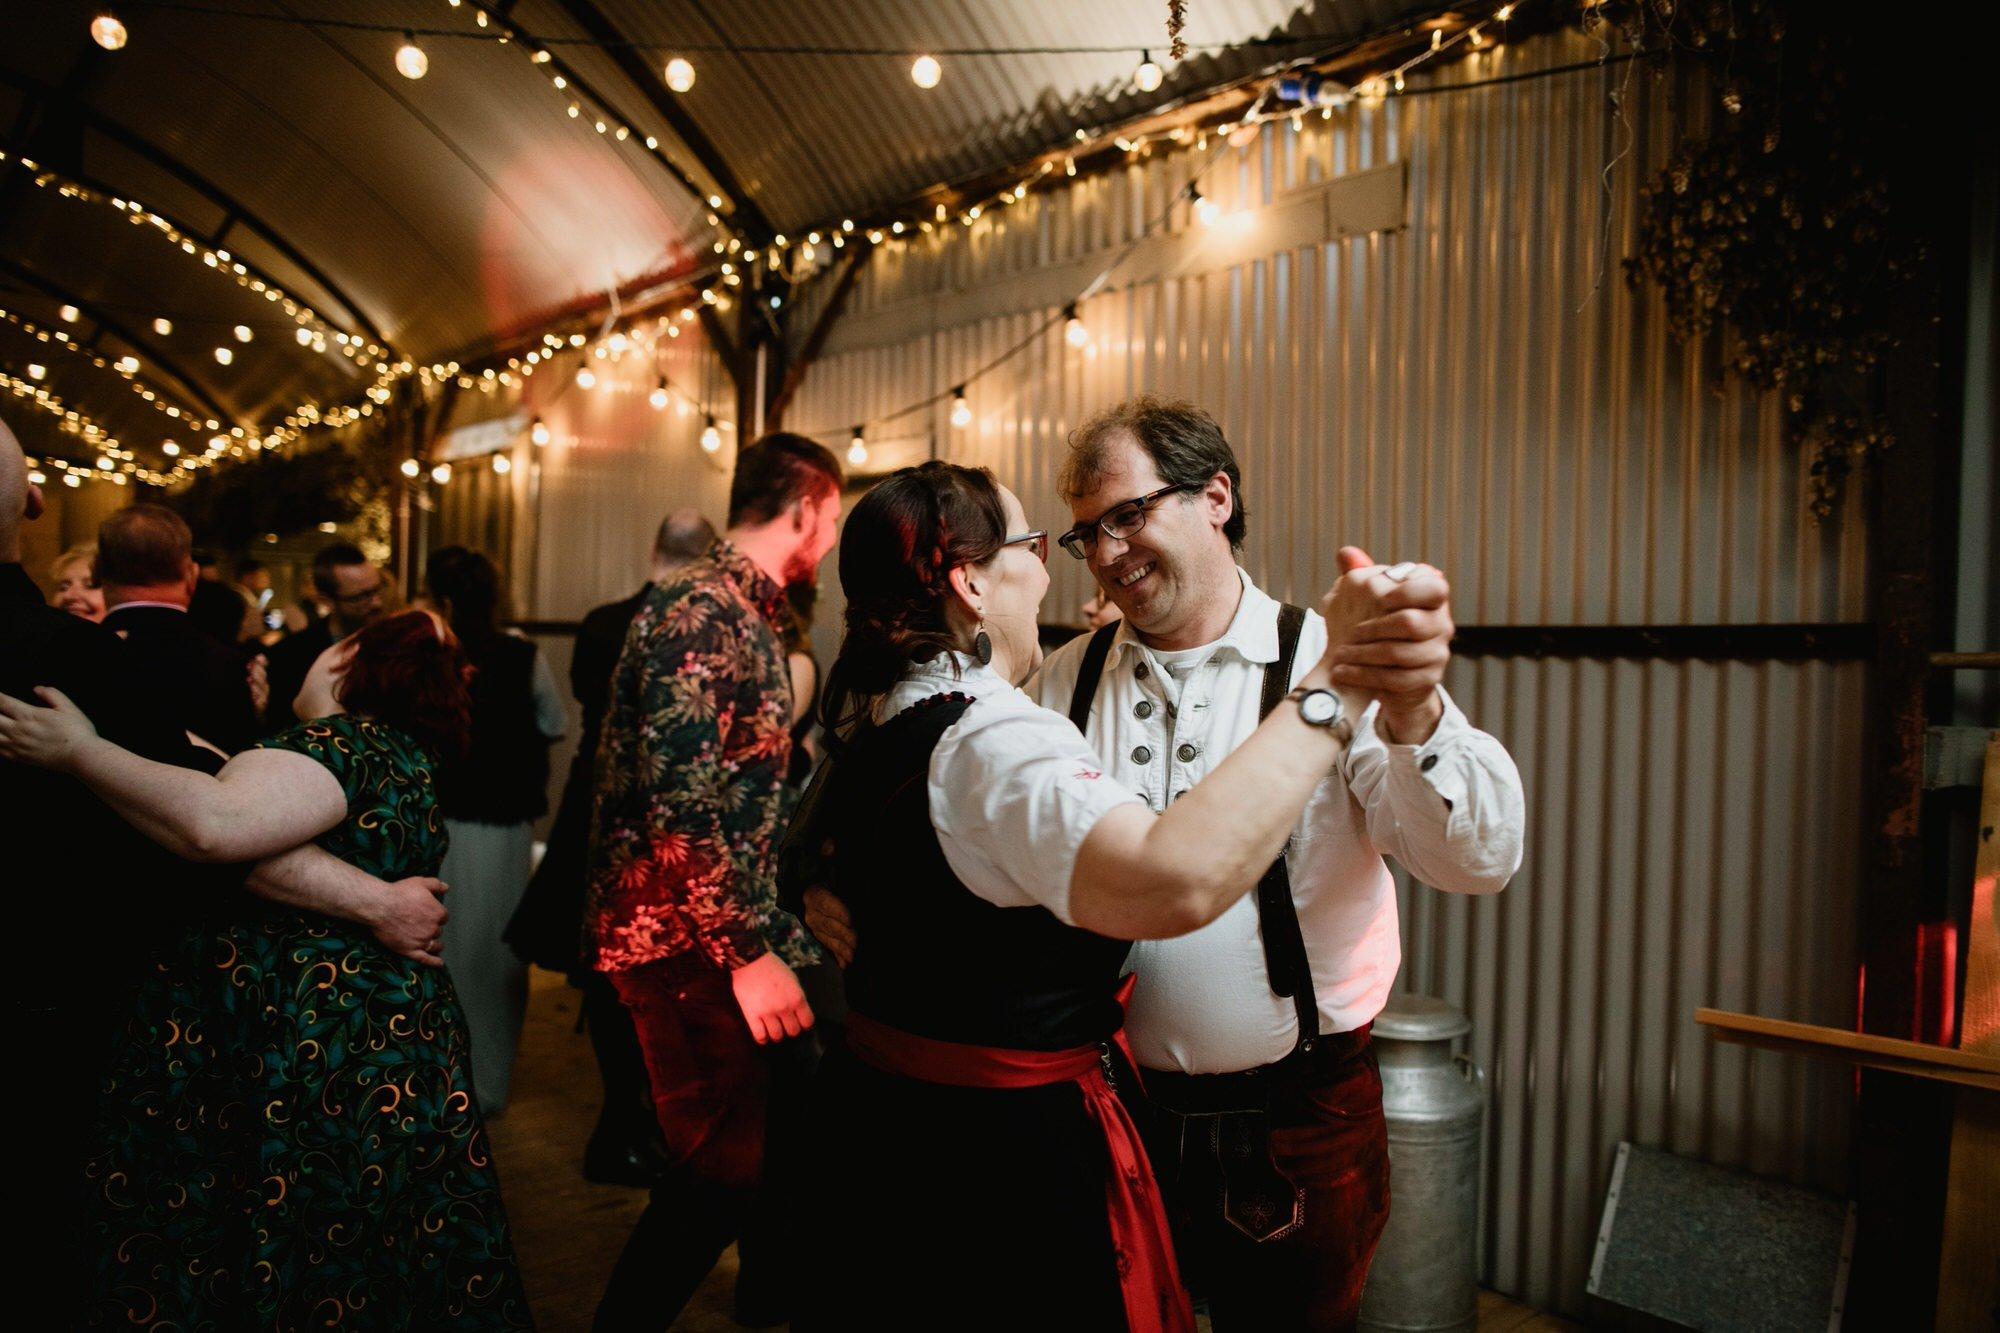 061 TIN SHED KNOCKRAICH WEDDING AUSTRIAN SCOTTISH ZOE ALEXANDRA PHOTOGRAPHY